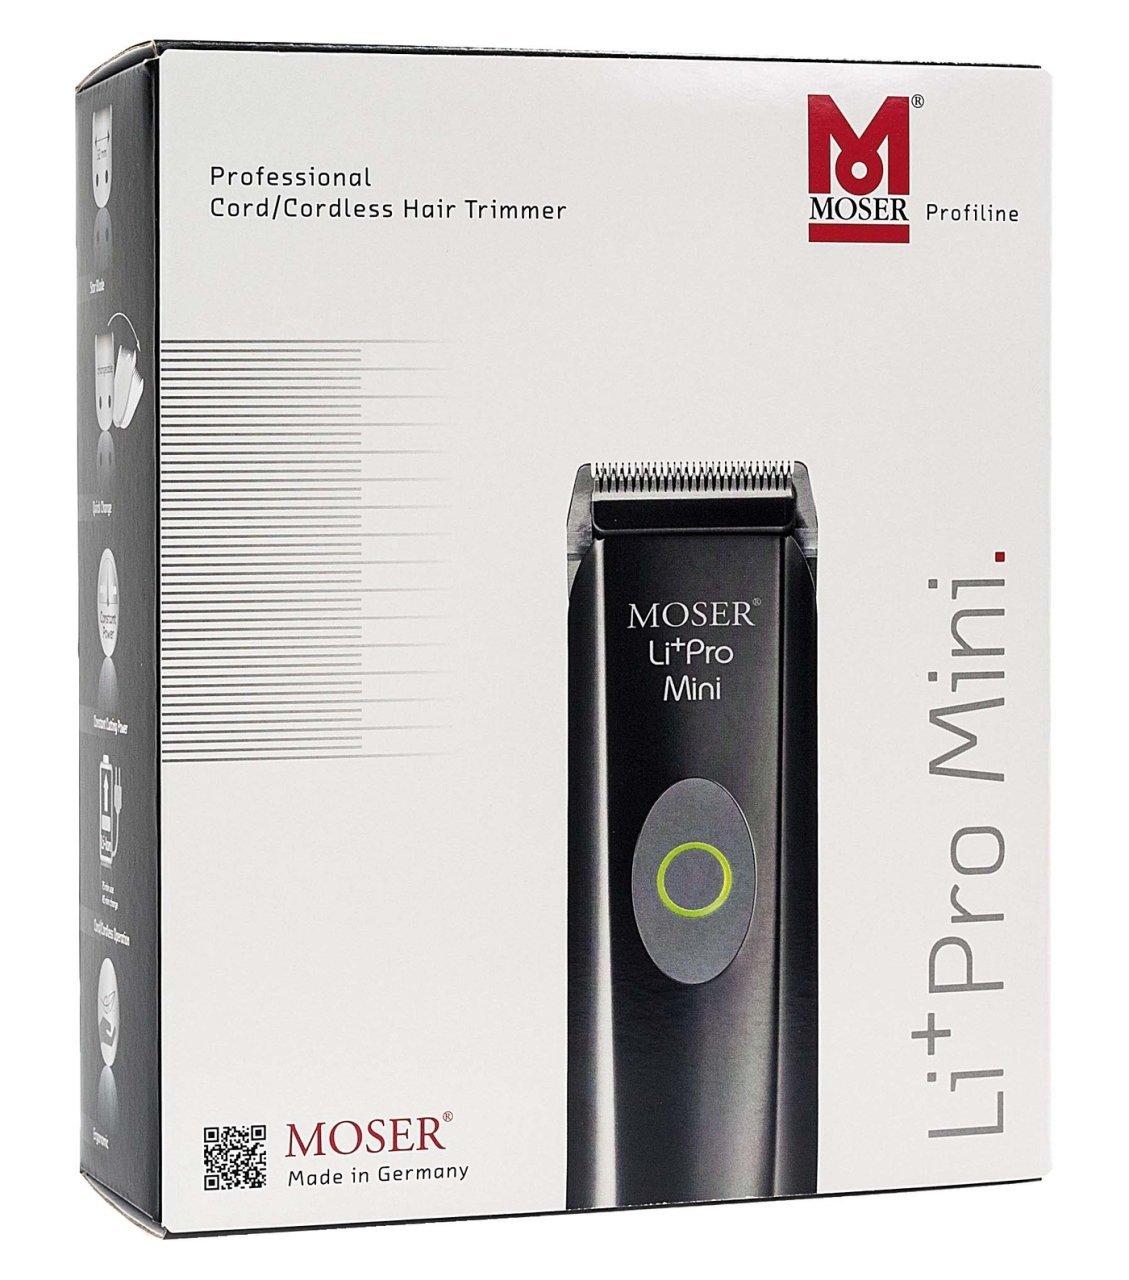 Moser 1884 Li+Pro